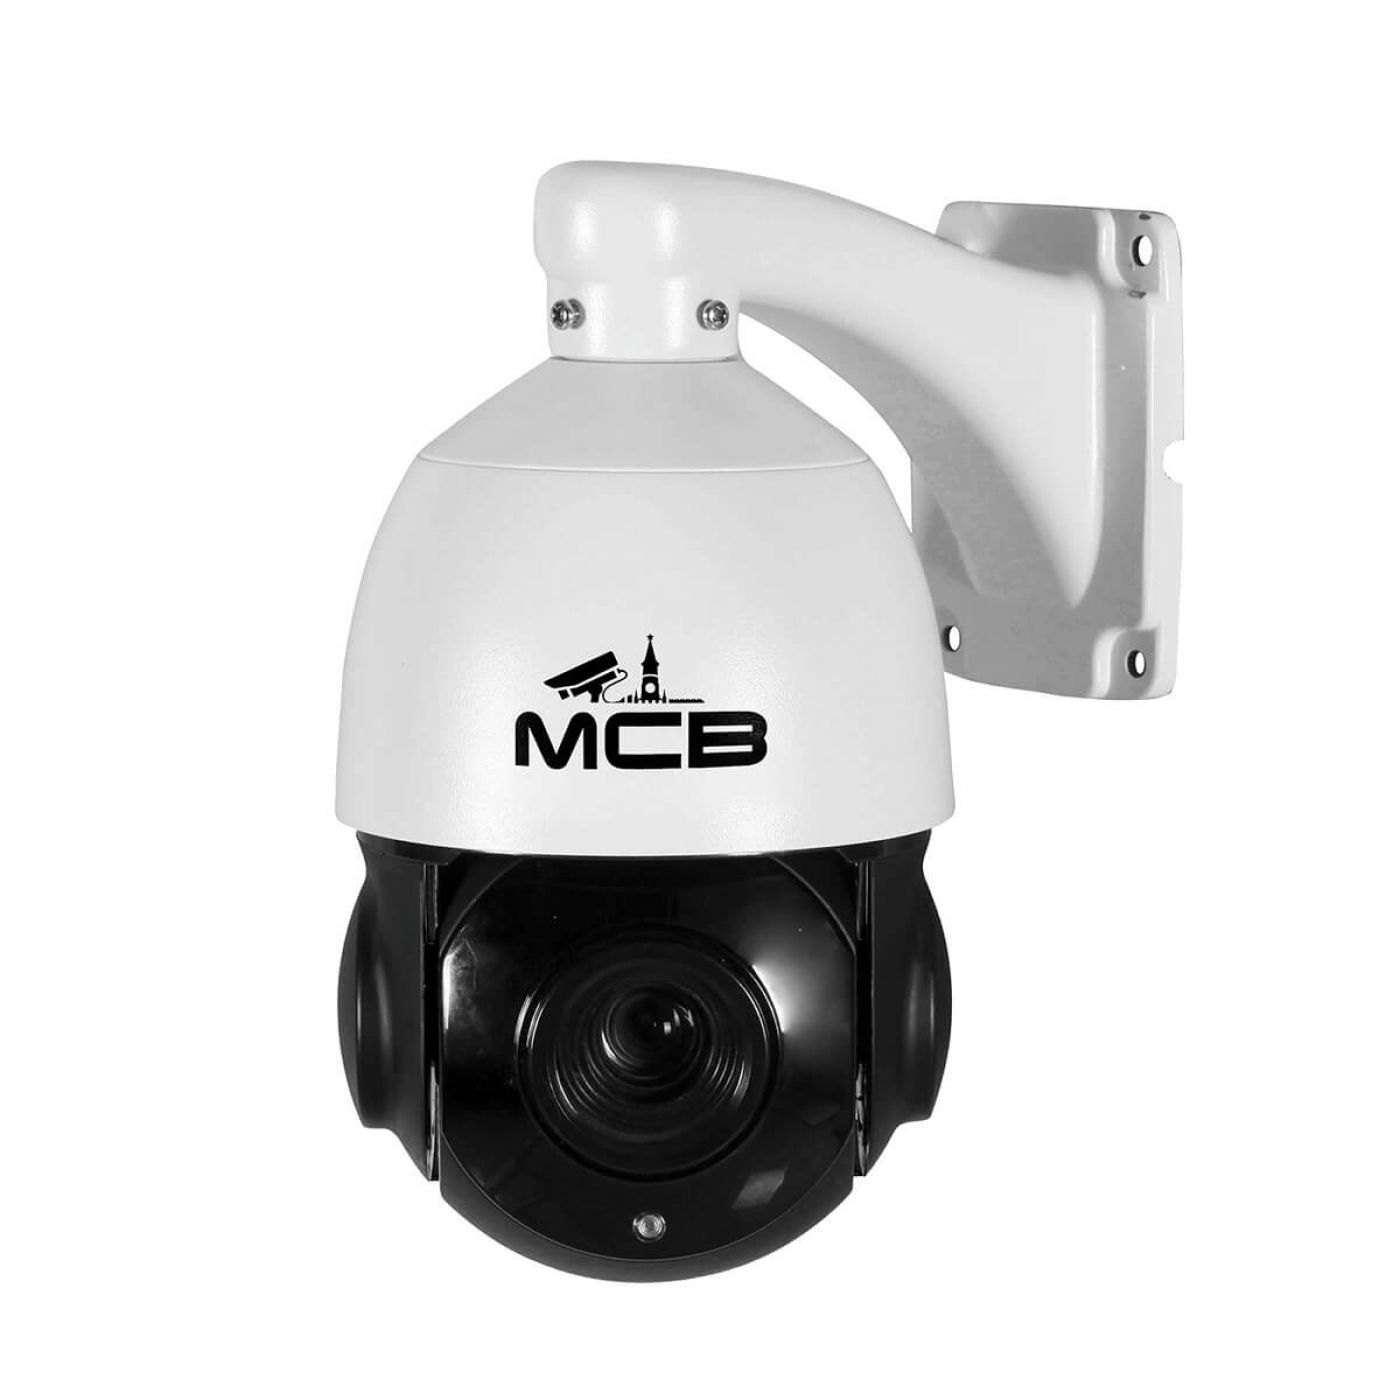 Уличная IP камера, 2 Мп (1920*1080), ИК-подсветка 60 м, Зум 36Х, Обзор 15-90°, POE